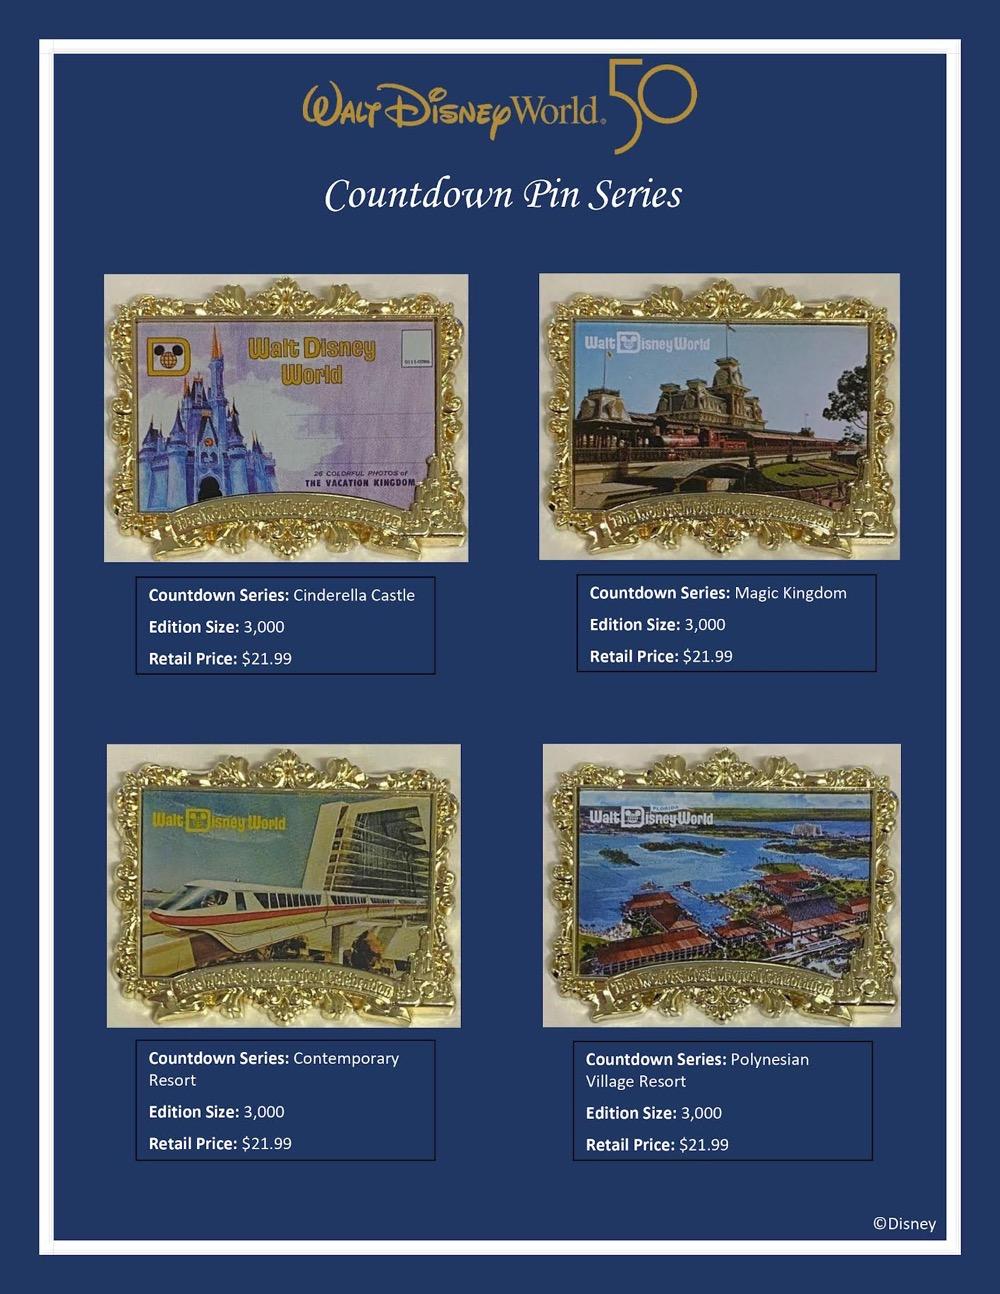 Walt Disney World 50th Anniversary Countdown Pin Series